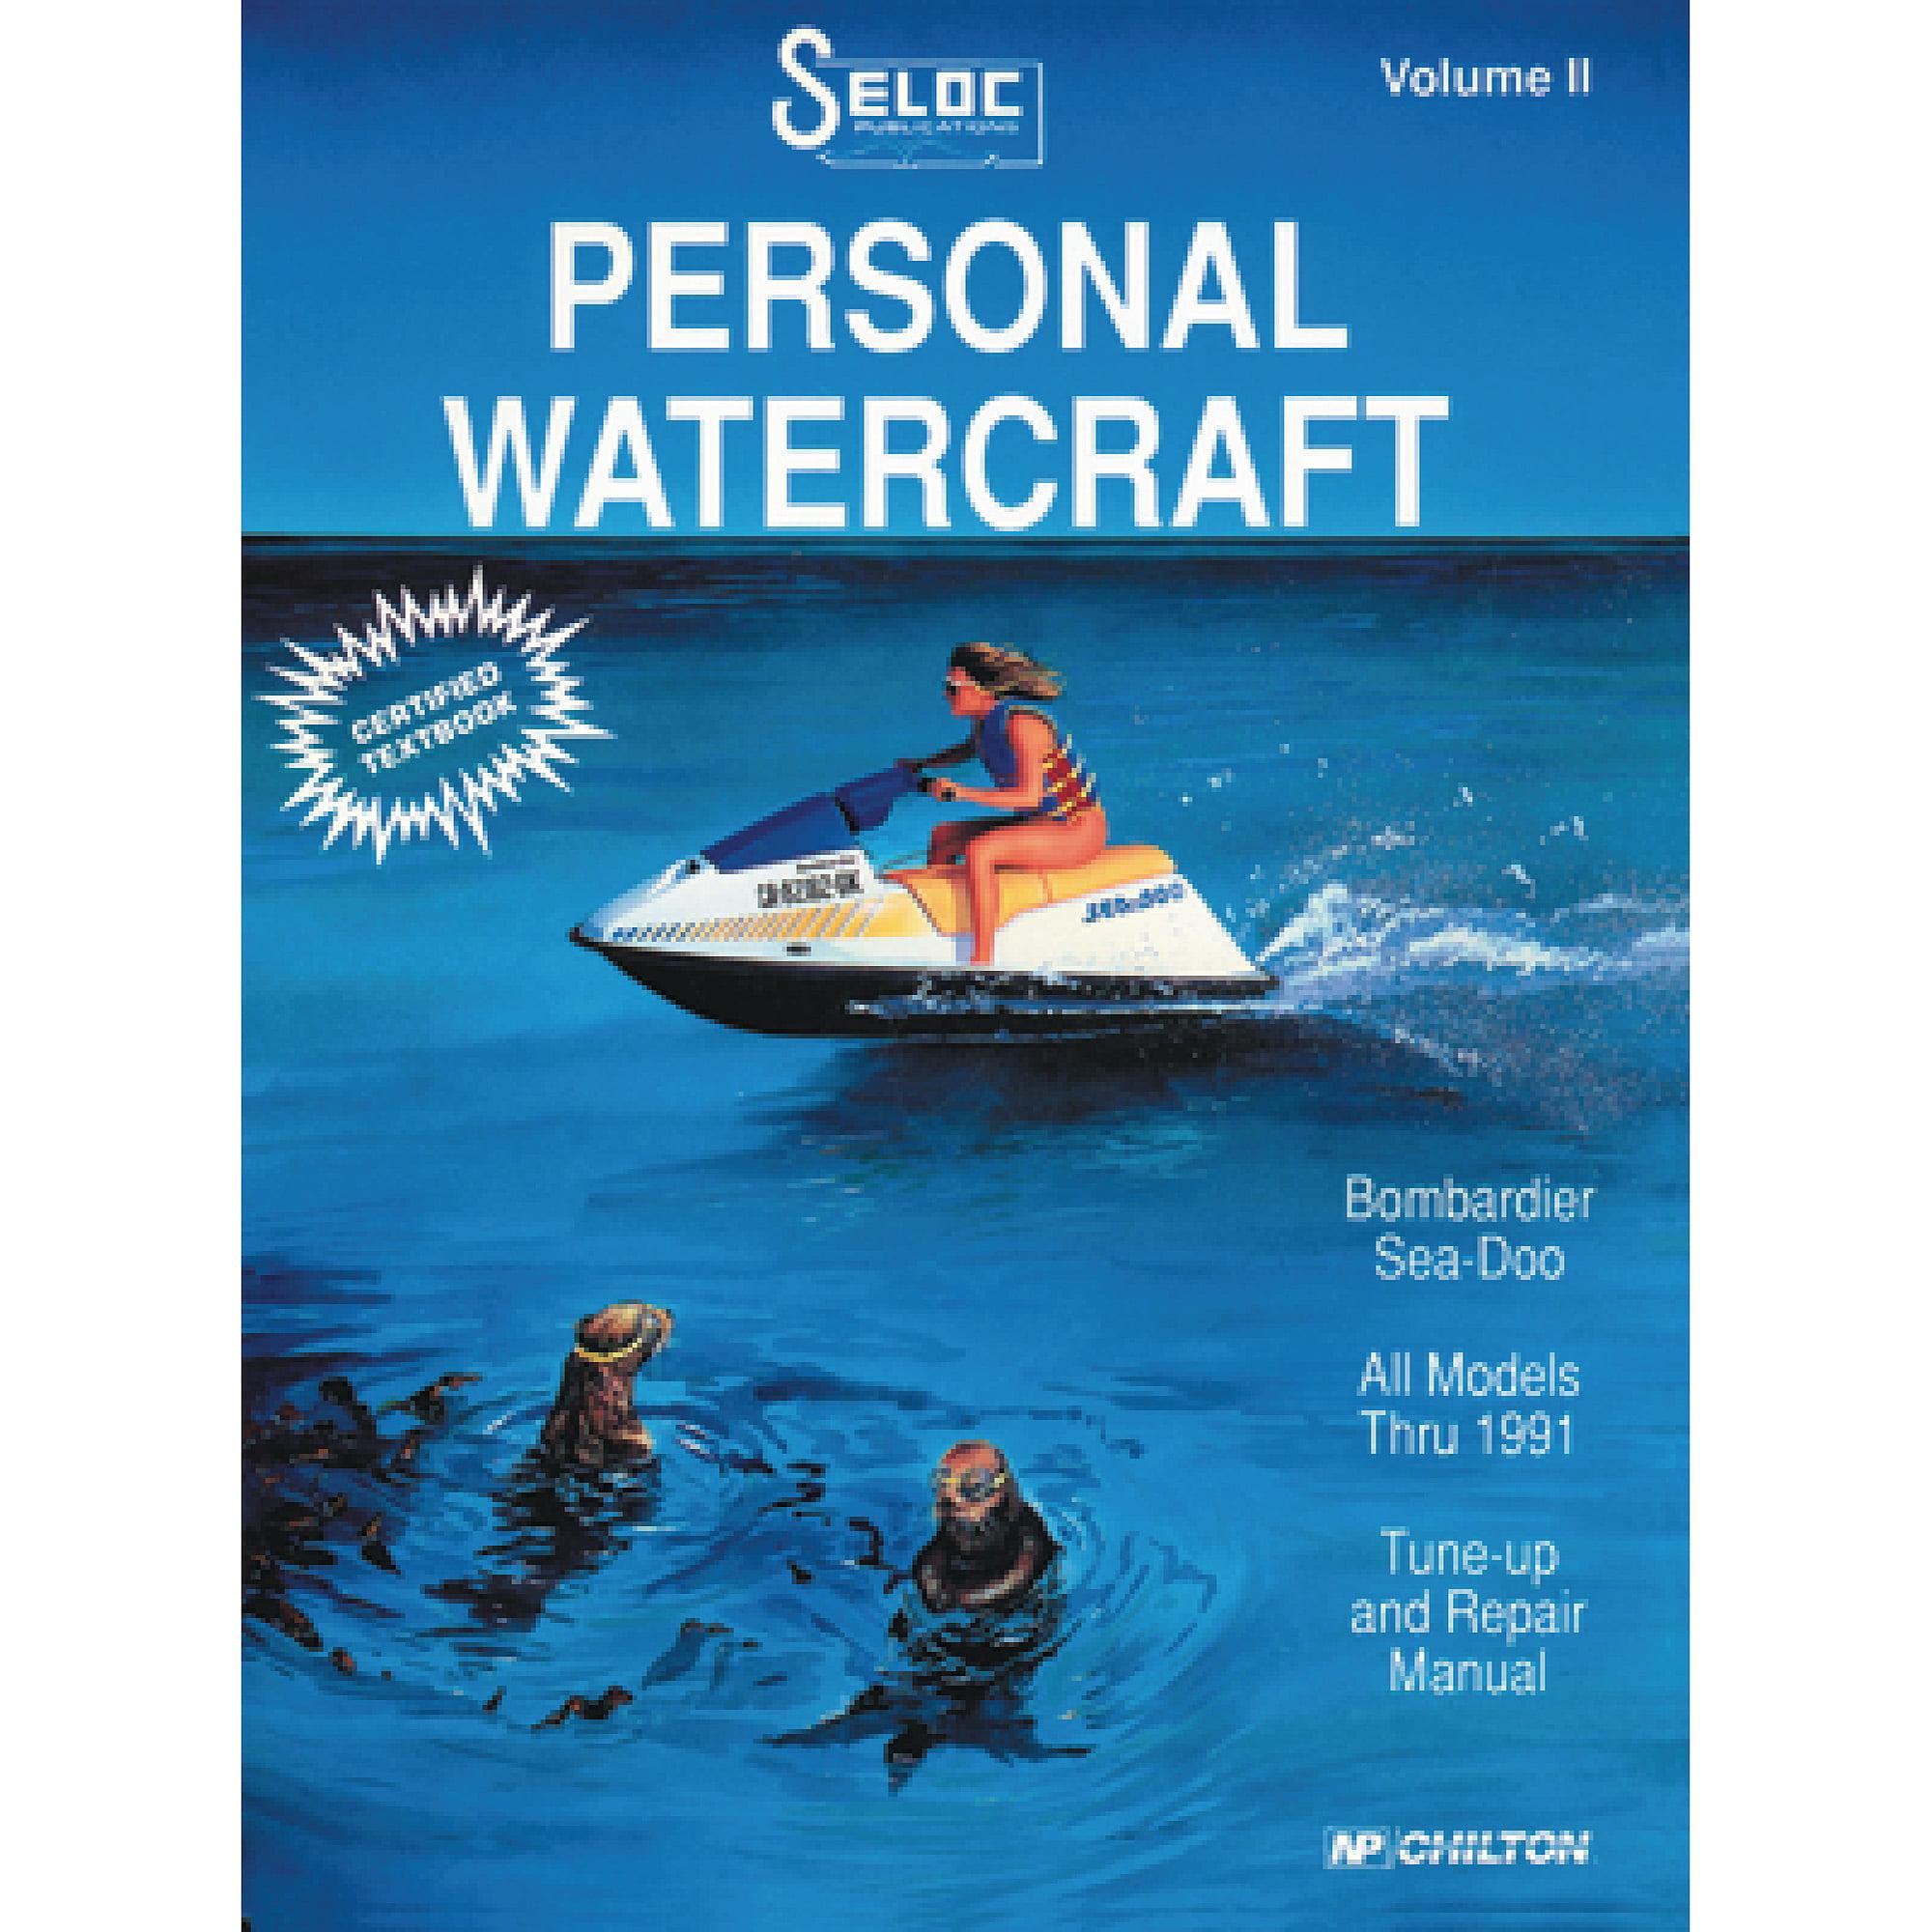 Seloc Marine Manual for Sea-Doo/Bombardier Personal Watercraft - Walmart.com